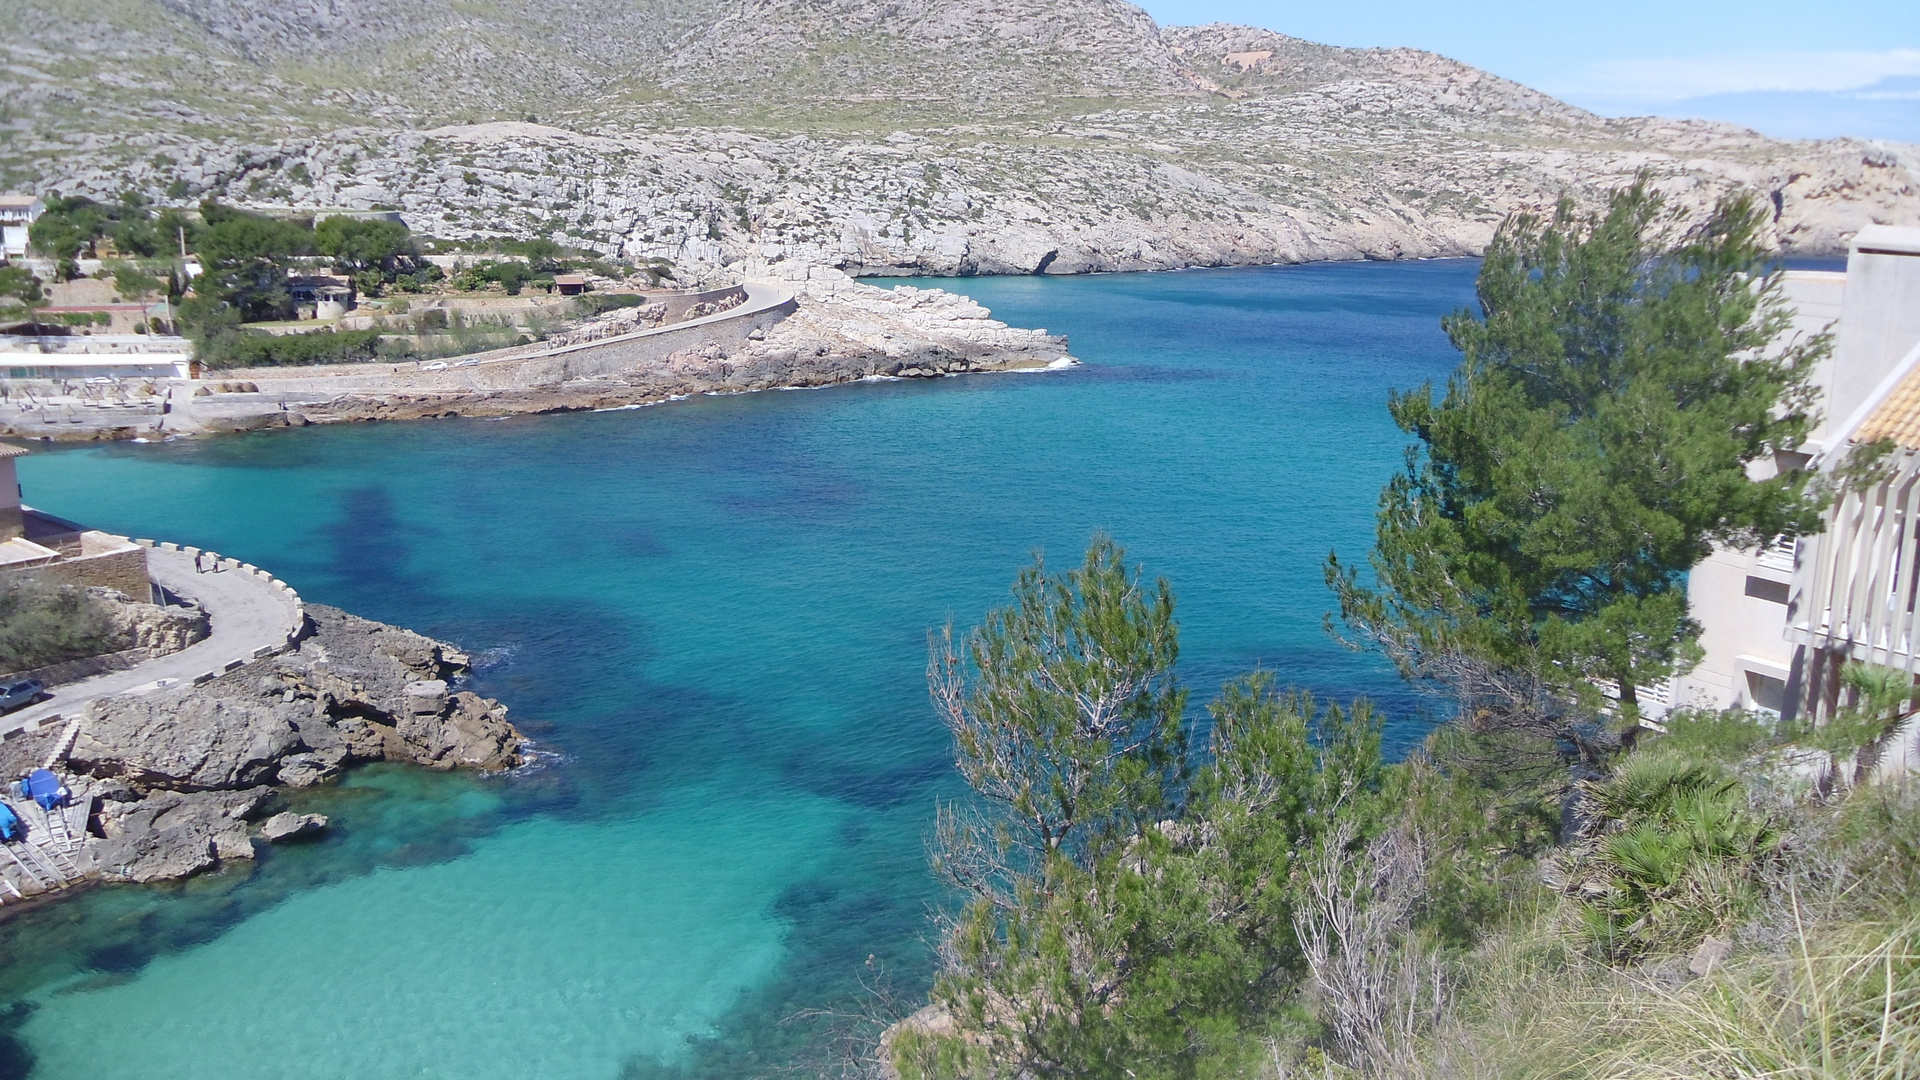 Bucht von Cala san Vicente, Mallorca